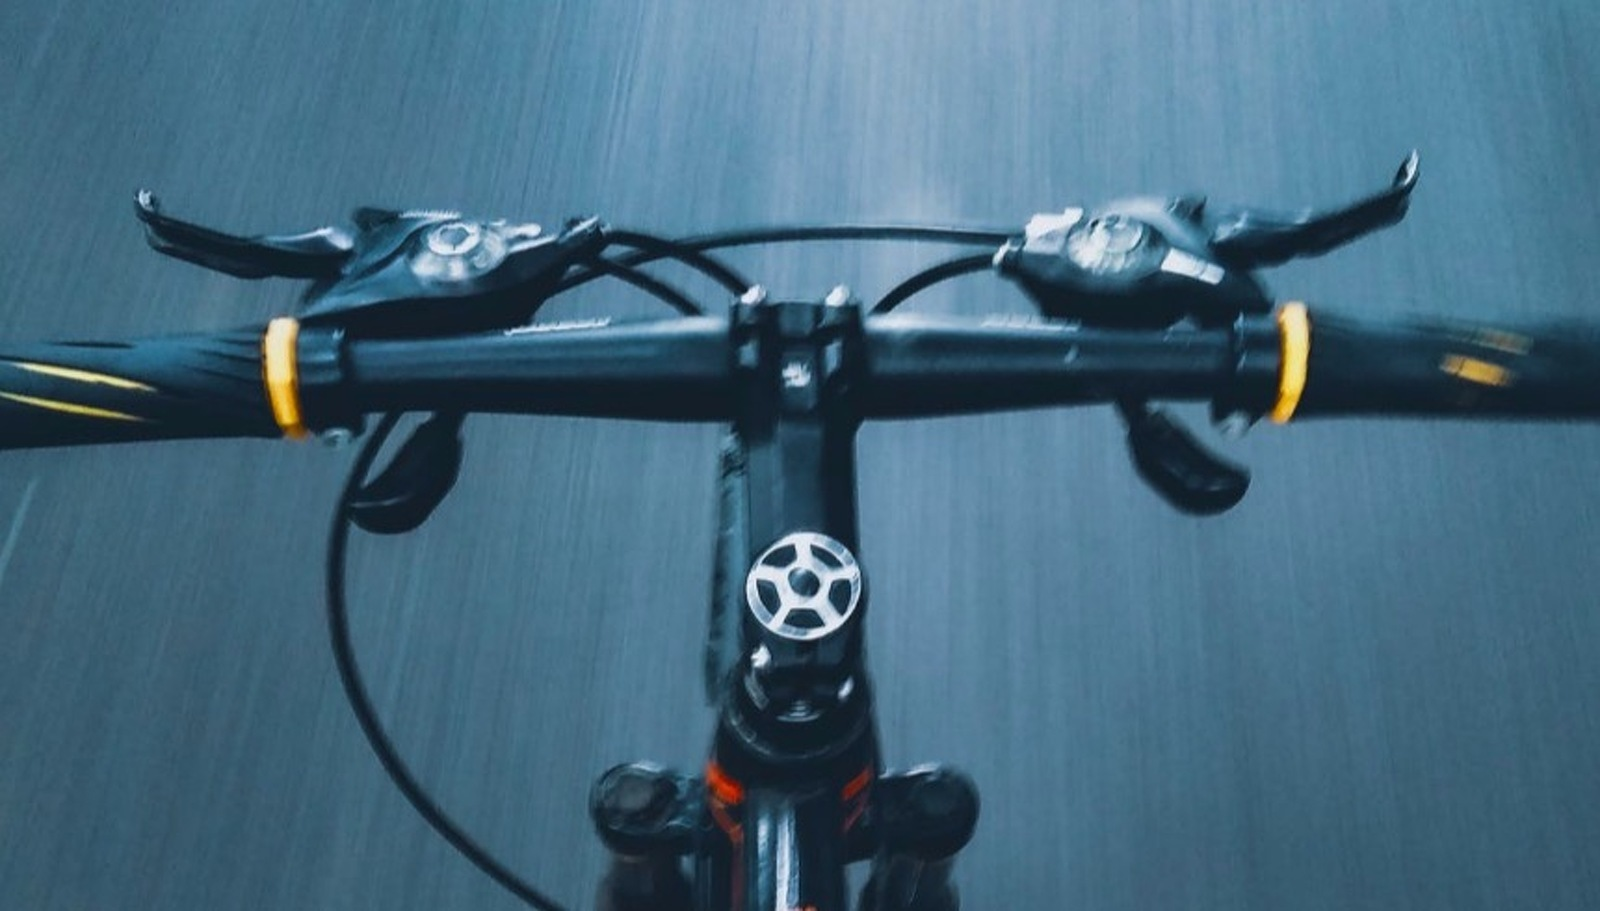 Manillar d'una bicicleta